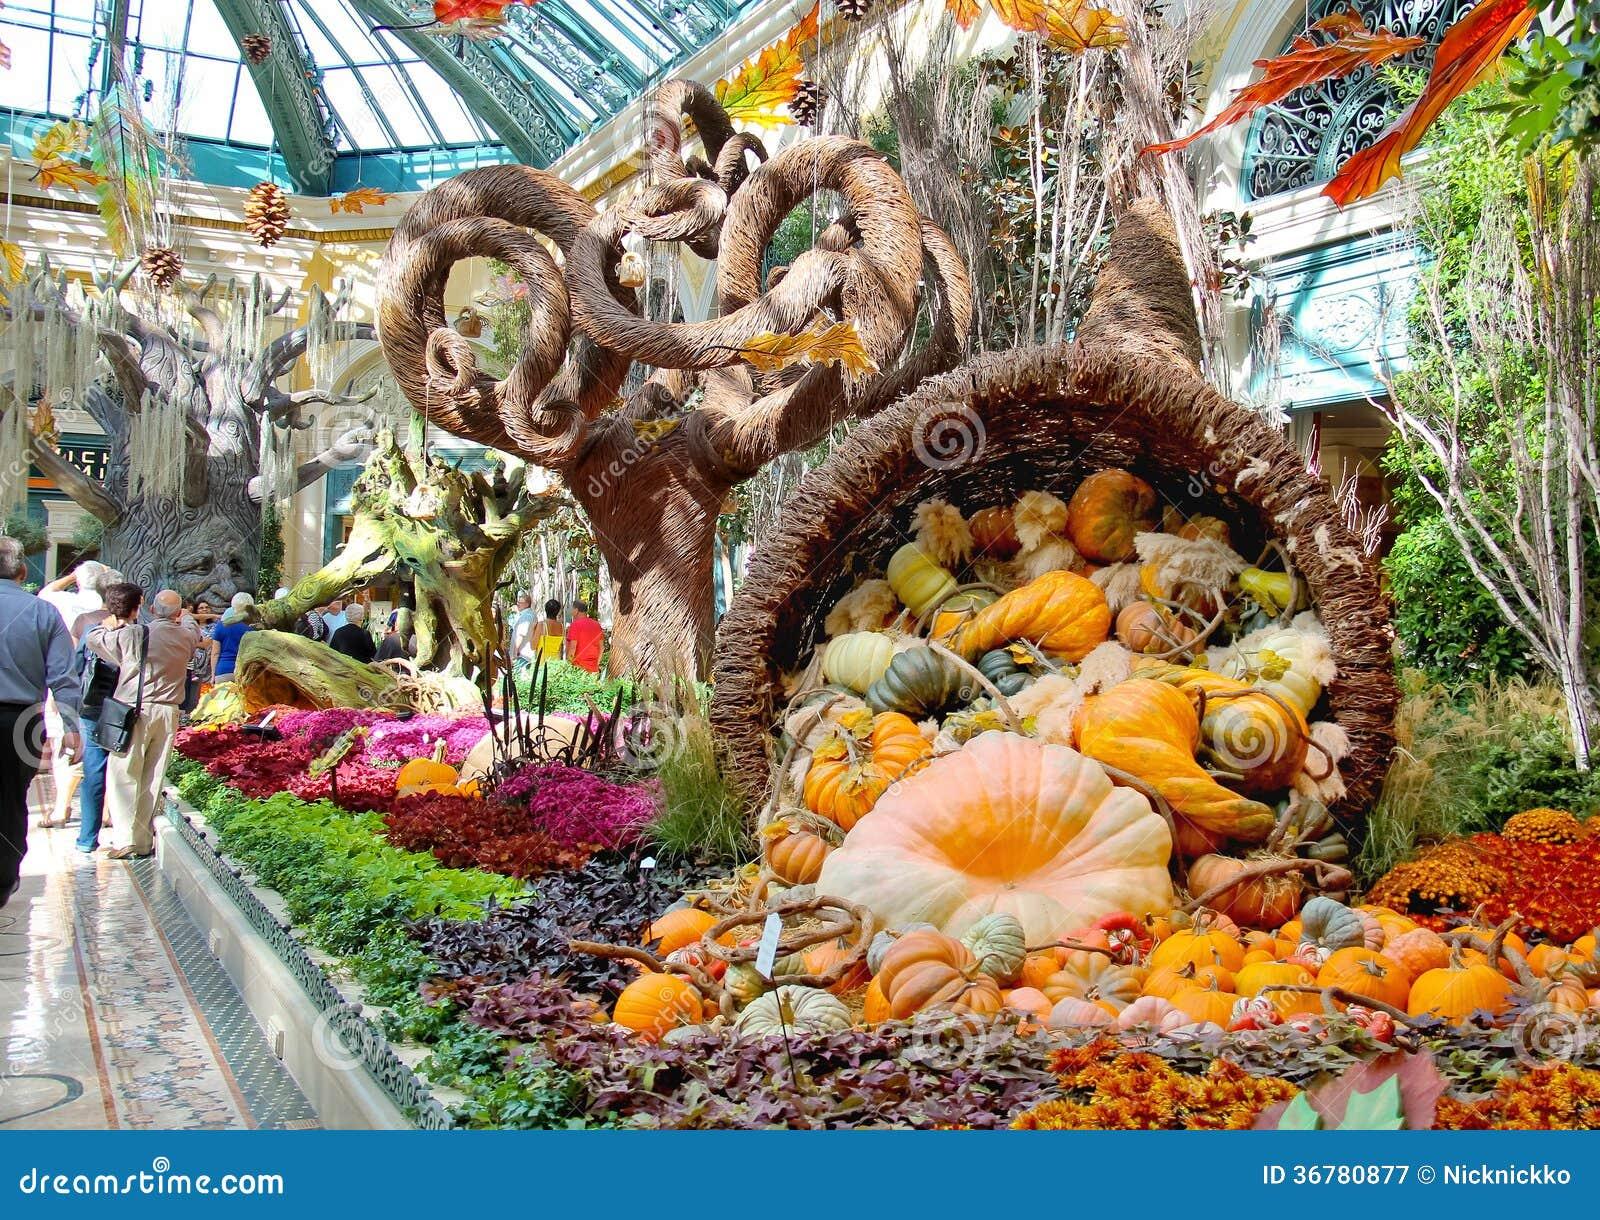 Autumn Theme In A Greenhouse At Bellagio Hotel In Las